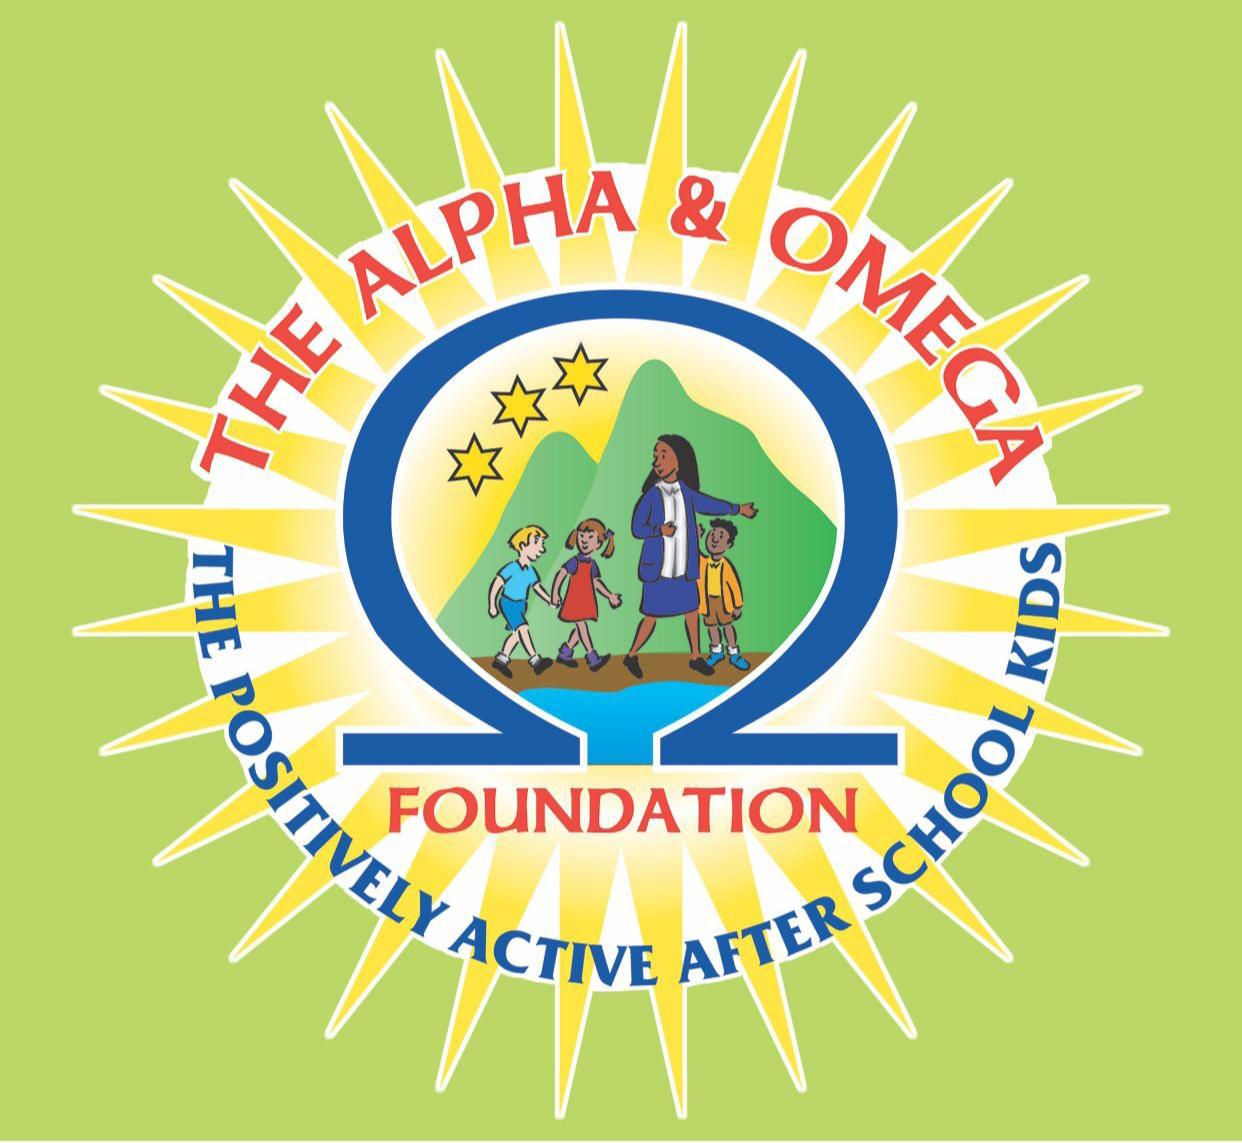 The Alpha & Omega Foundation